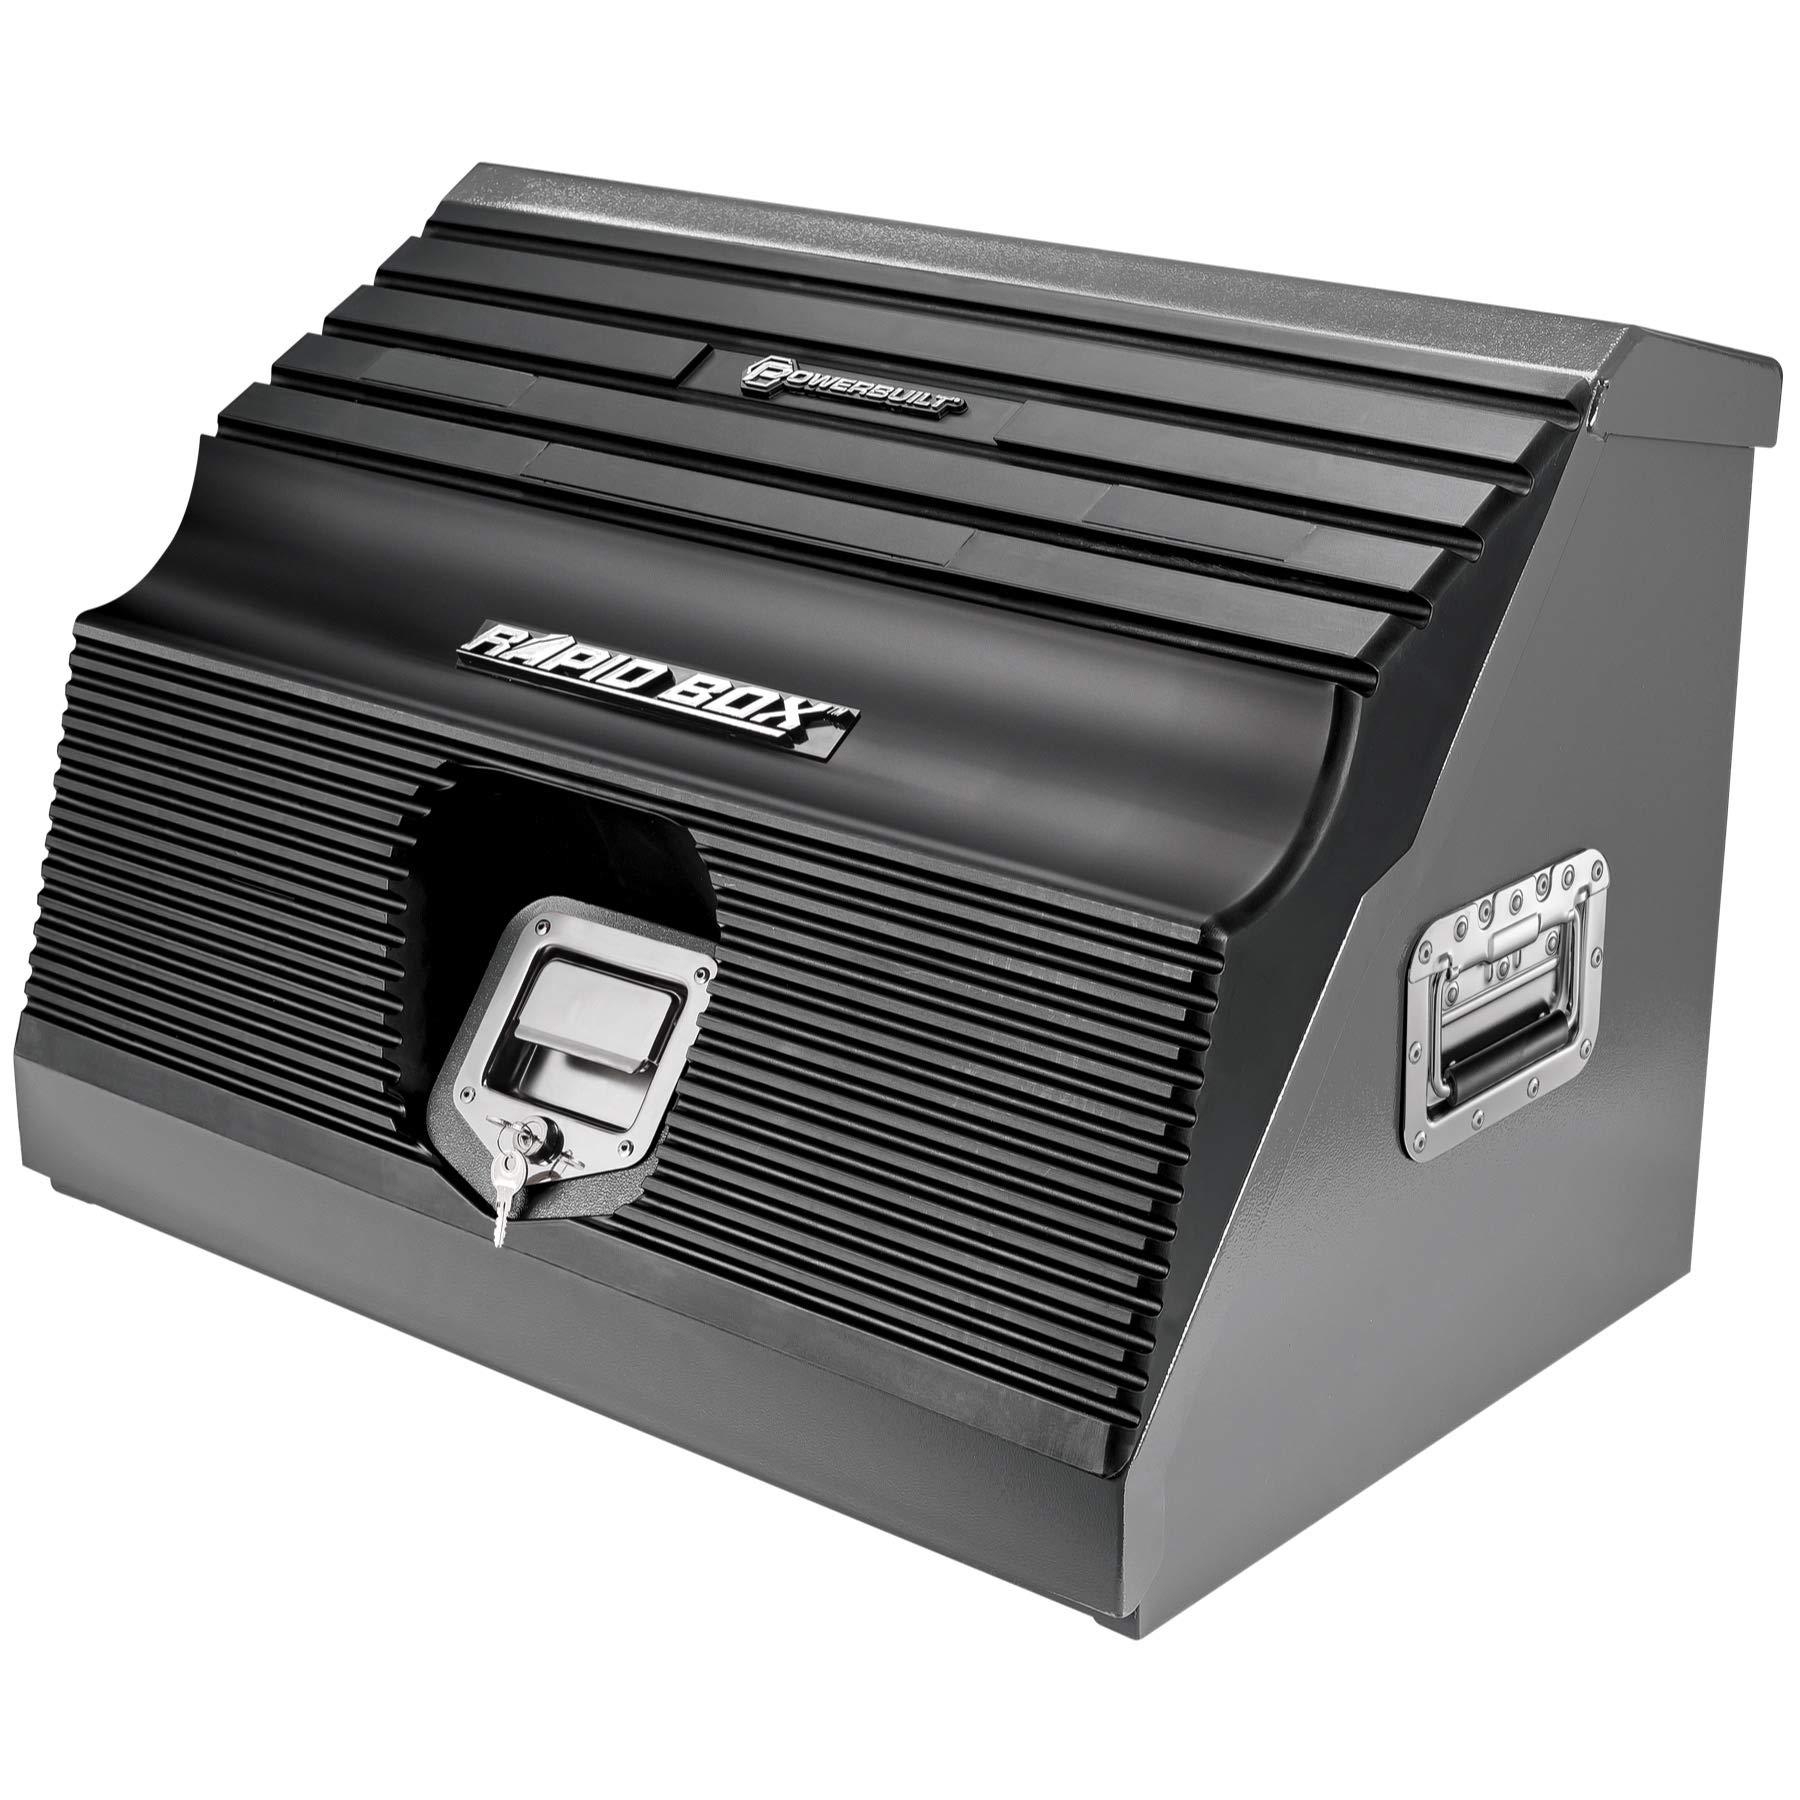 Powerbuilt 26'' Rapid Box Portable Slant Front Tool Box Grey - 240111